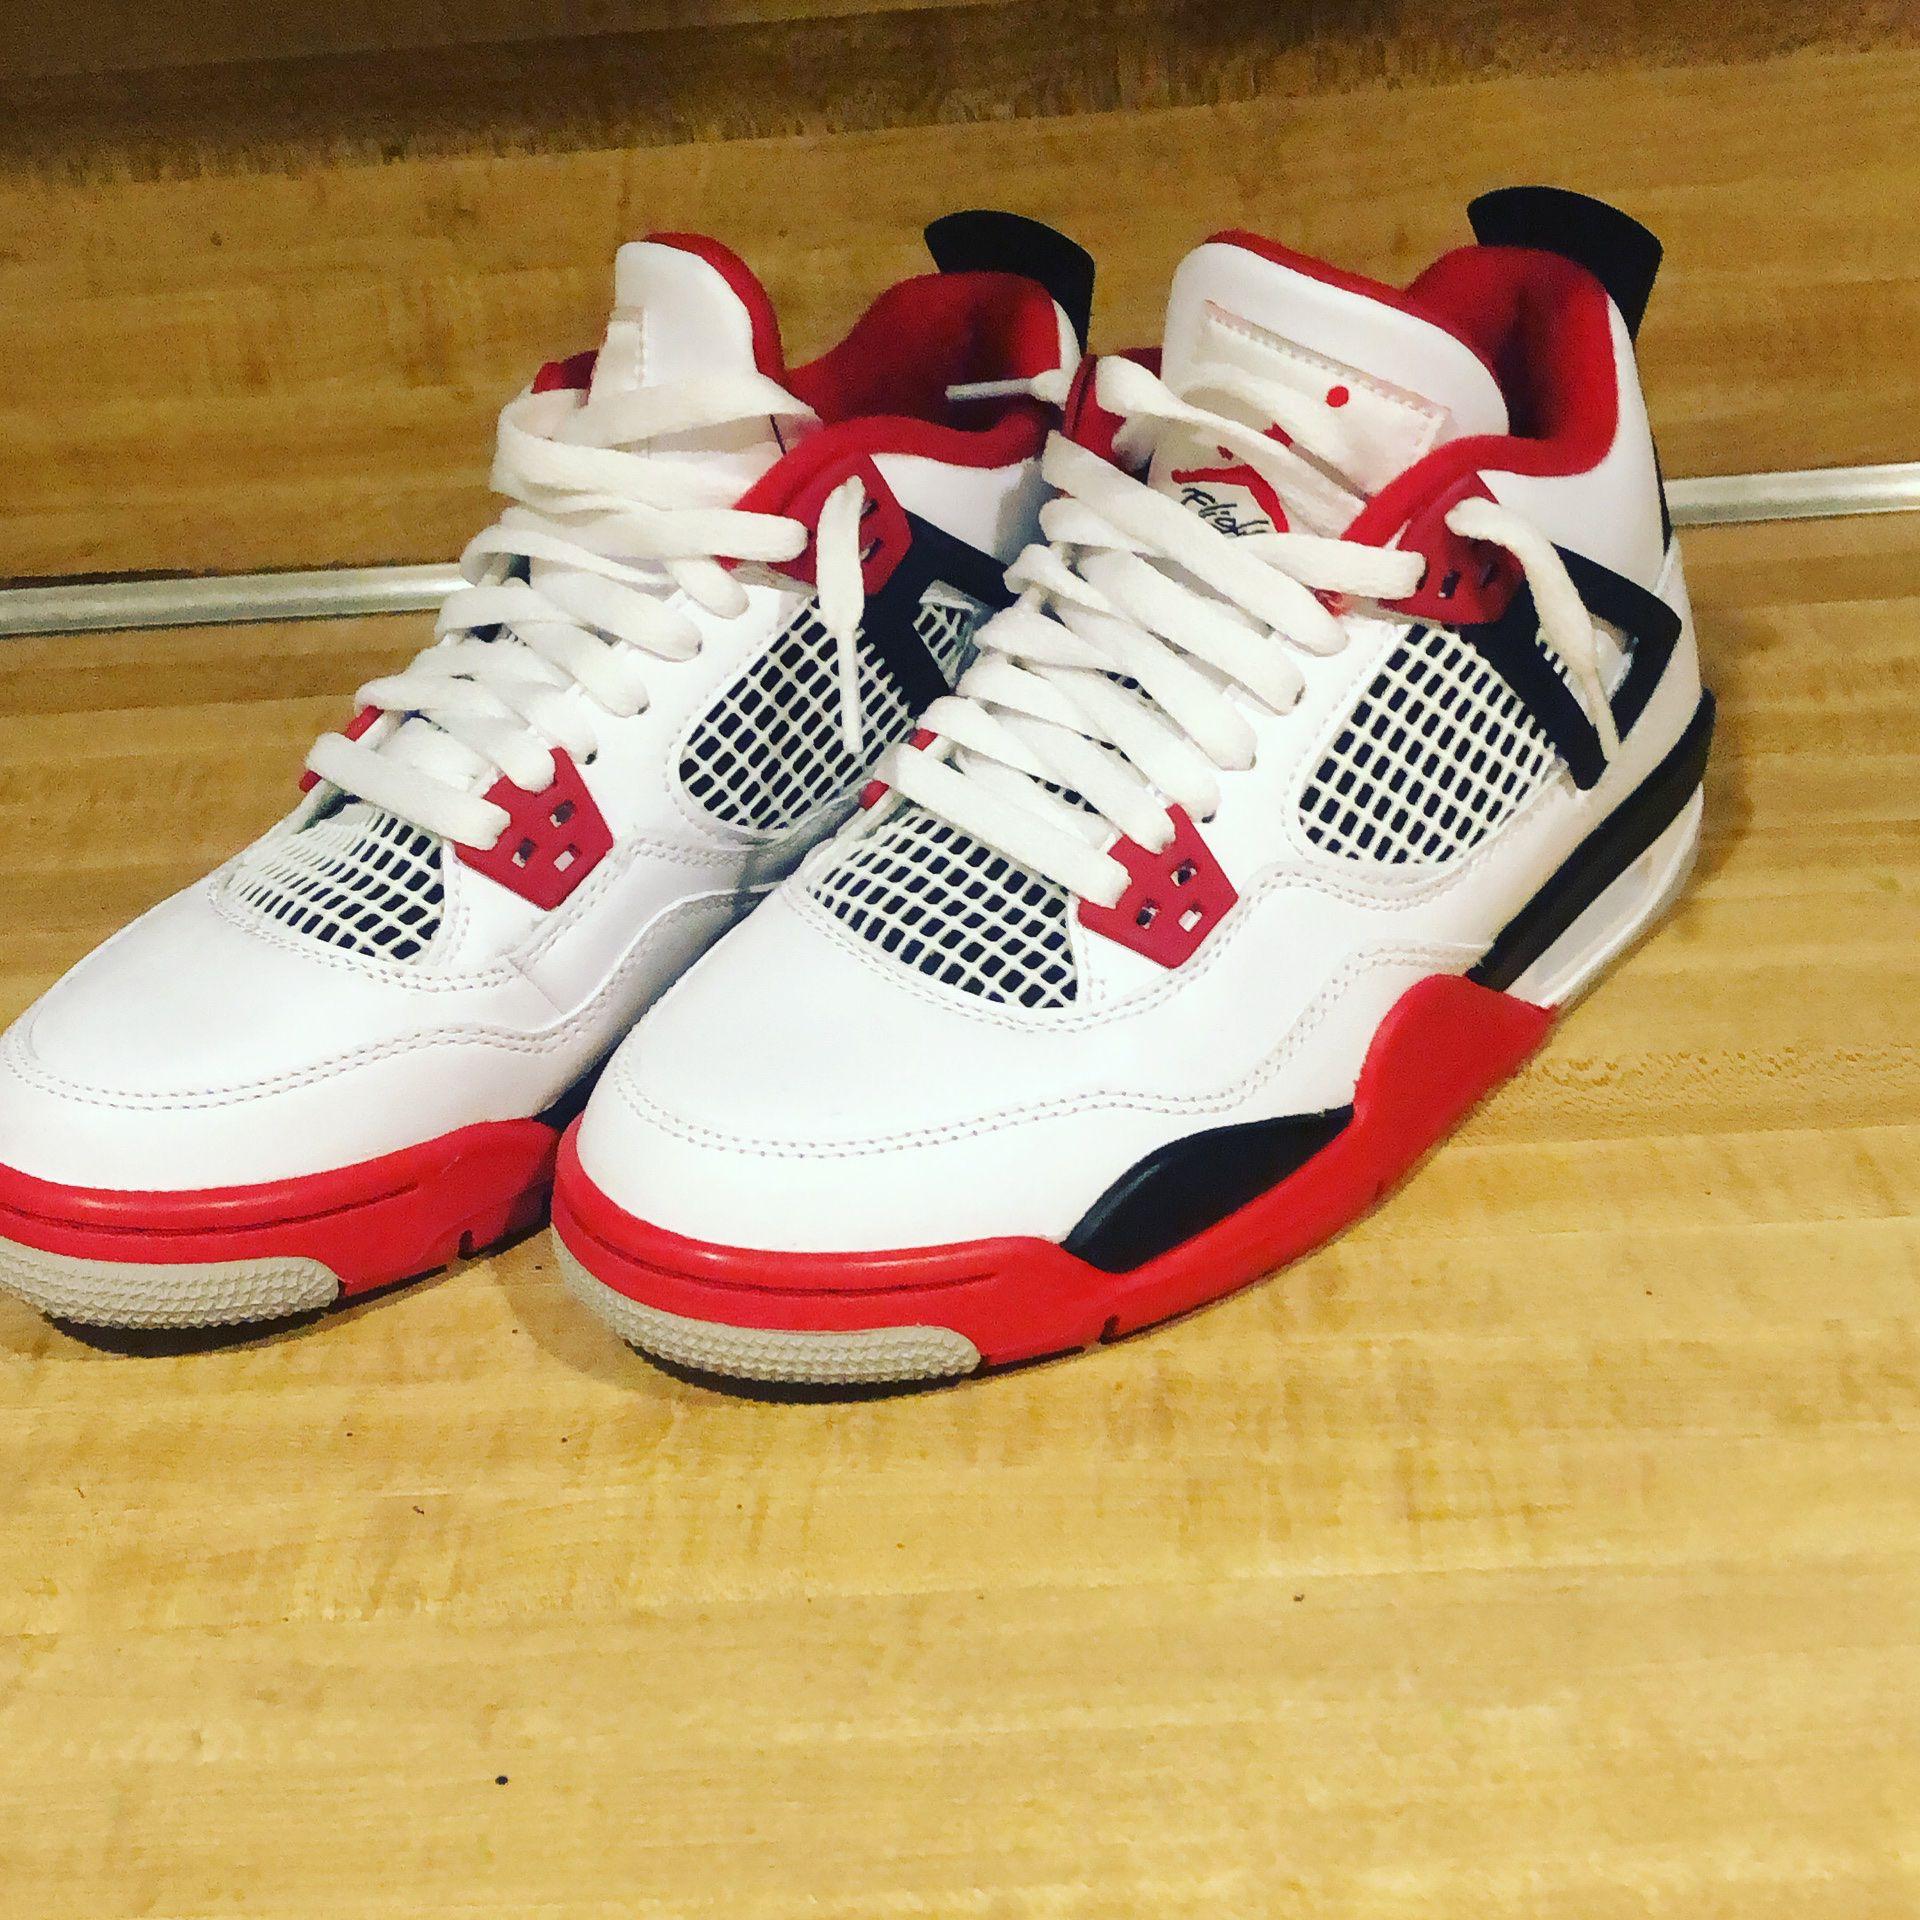 Jordan 4 Fire Red 2020